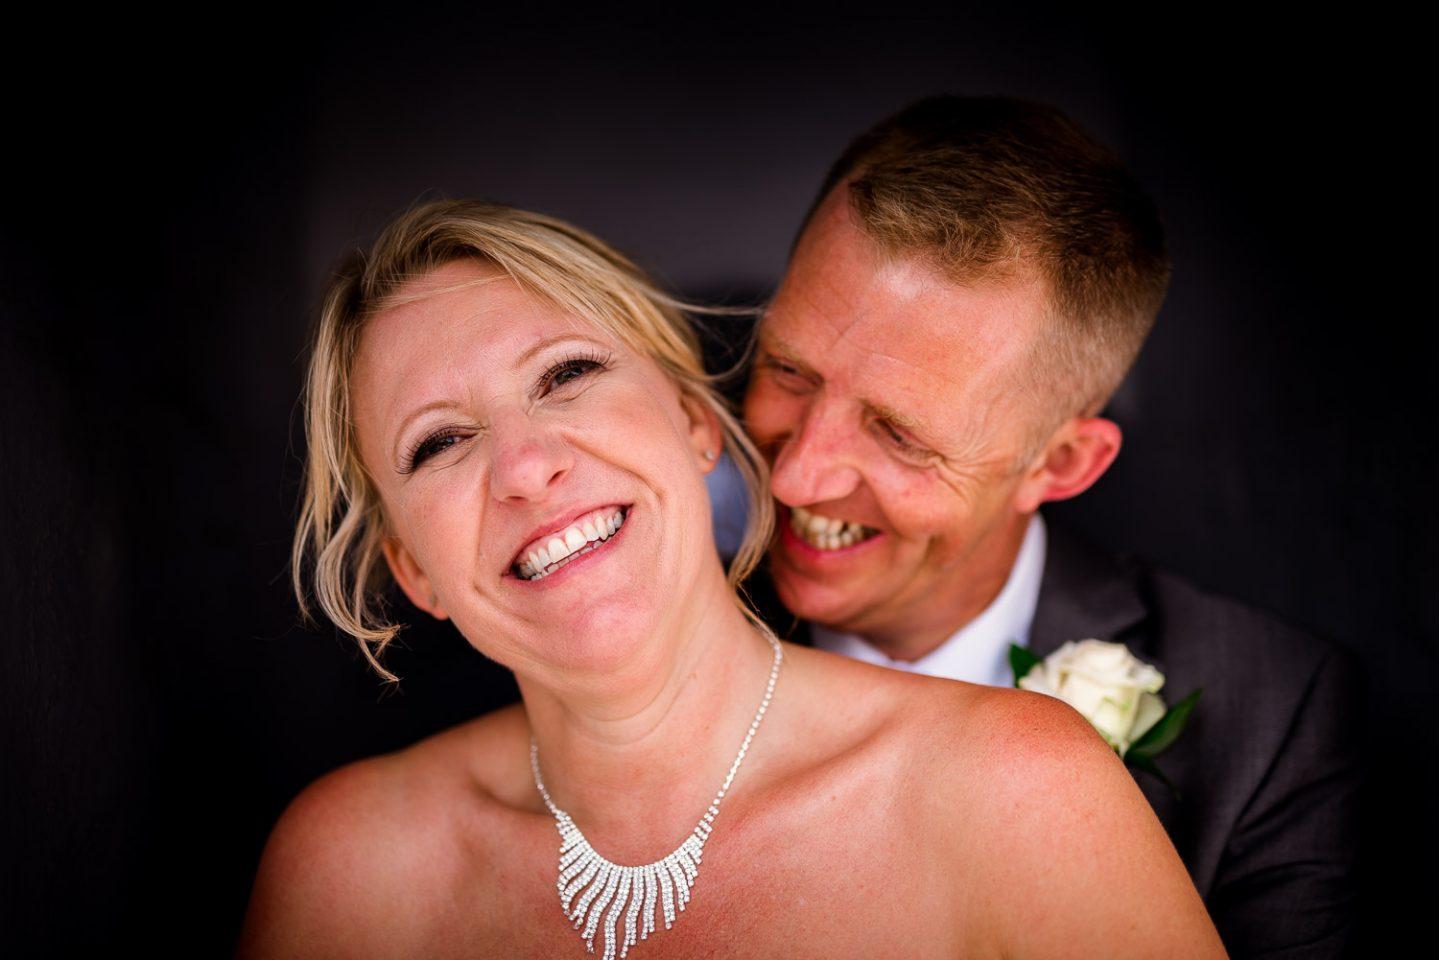 Southwold Wedding photography by Andrew Kahumbu